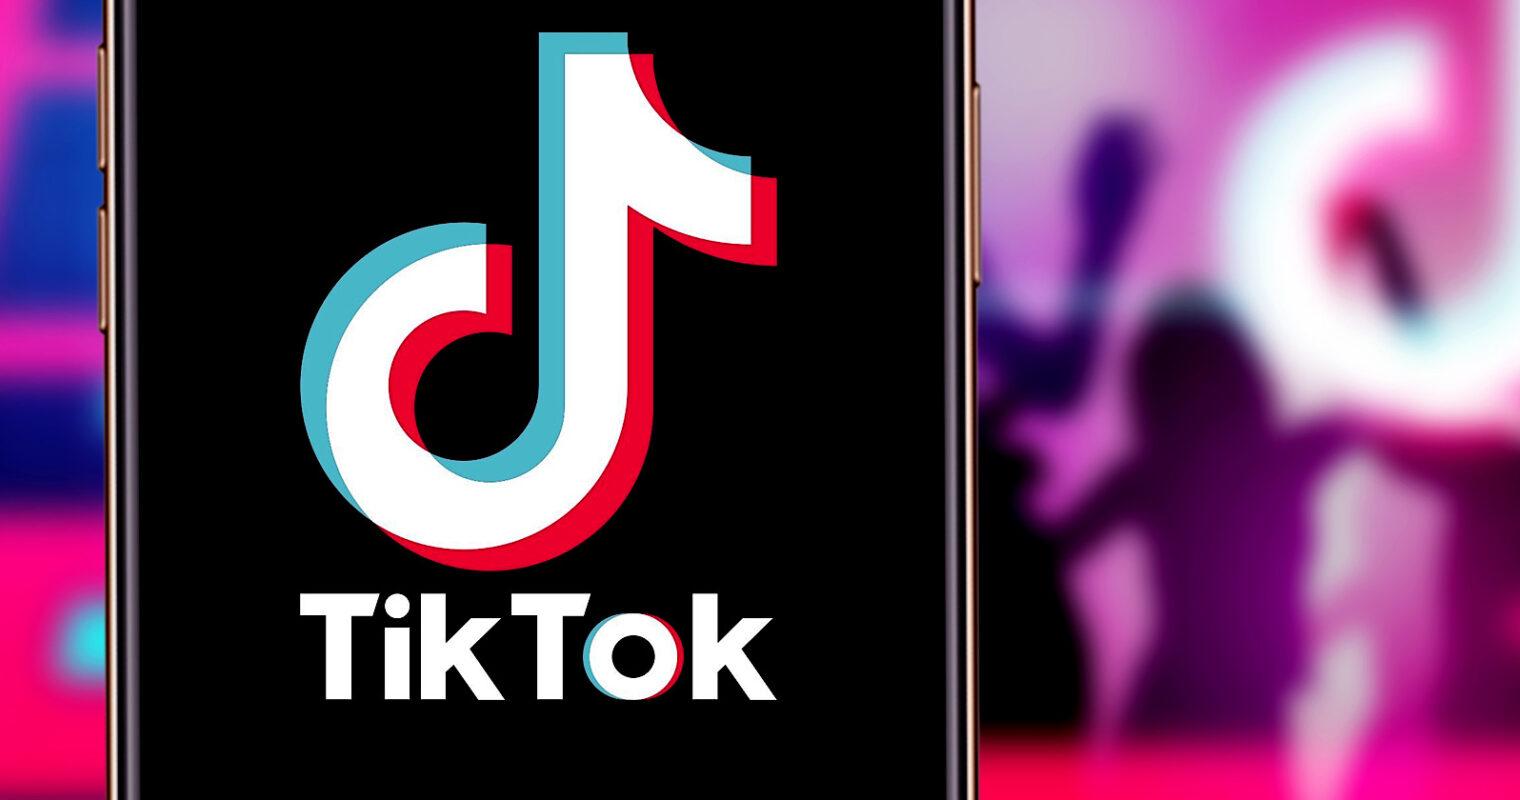 Pakistan Bans TikTok For 'Peddling Vulgarity'